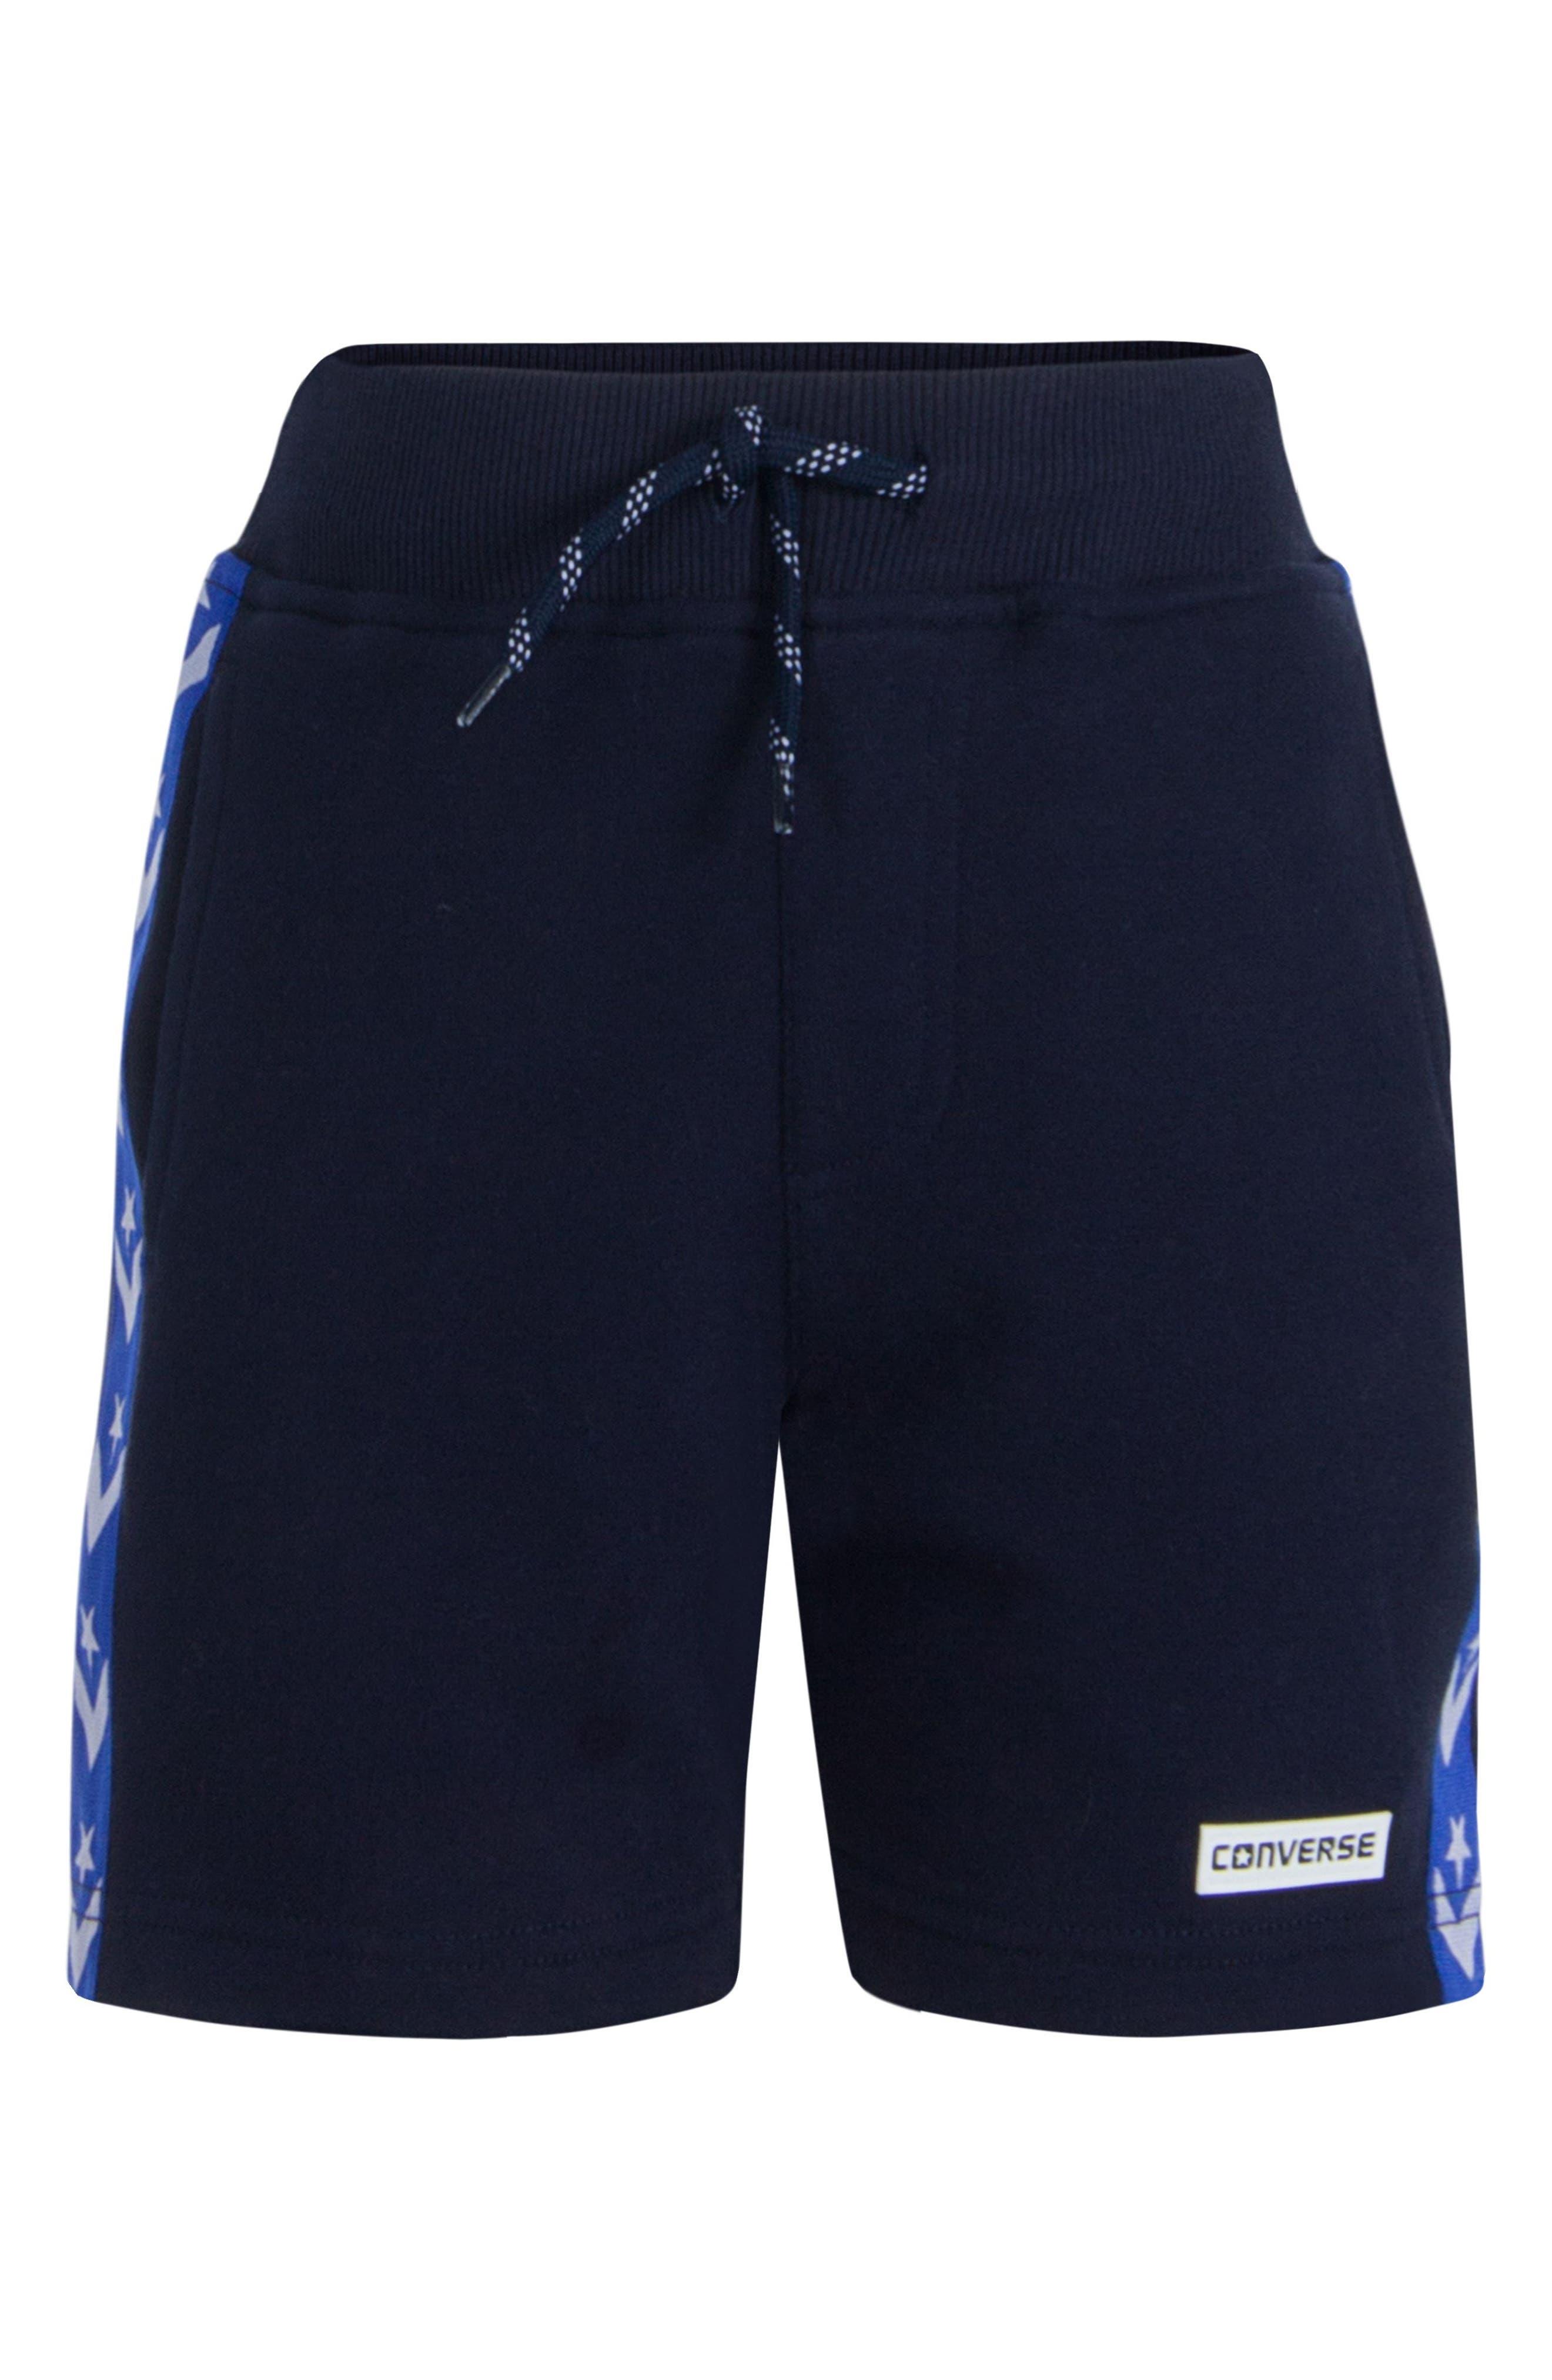 Star Knit Shorts,                         Main,                         color, Obsidian